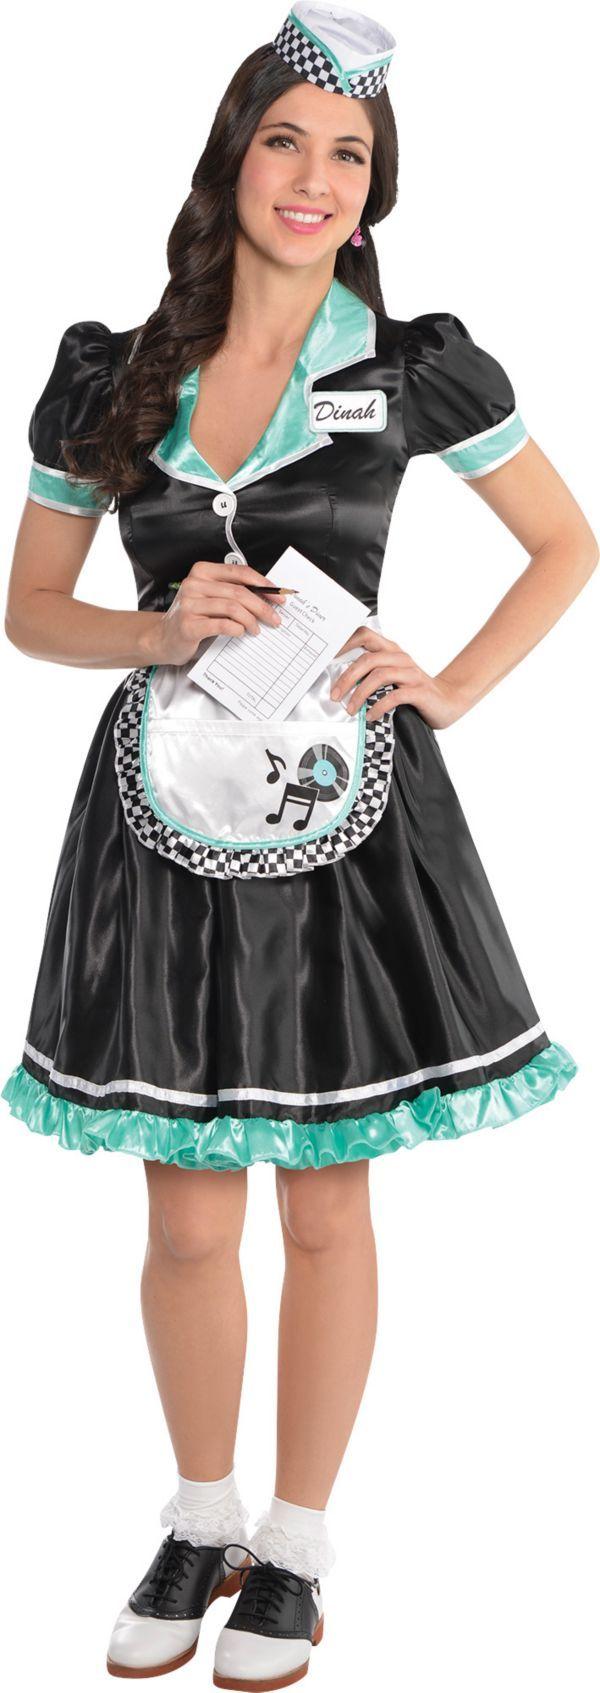 Adult Dinah Delight Waitress Costume $30  sc 1 st  Pinterest & Adult Dinah Delight Waitress Costume $30 | ????????? ...